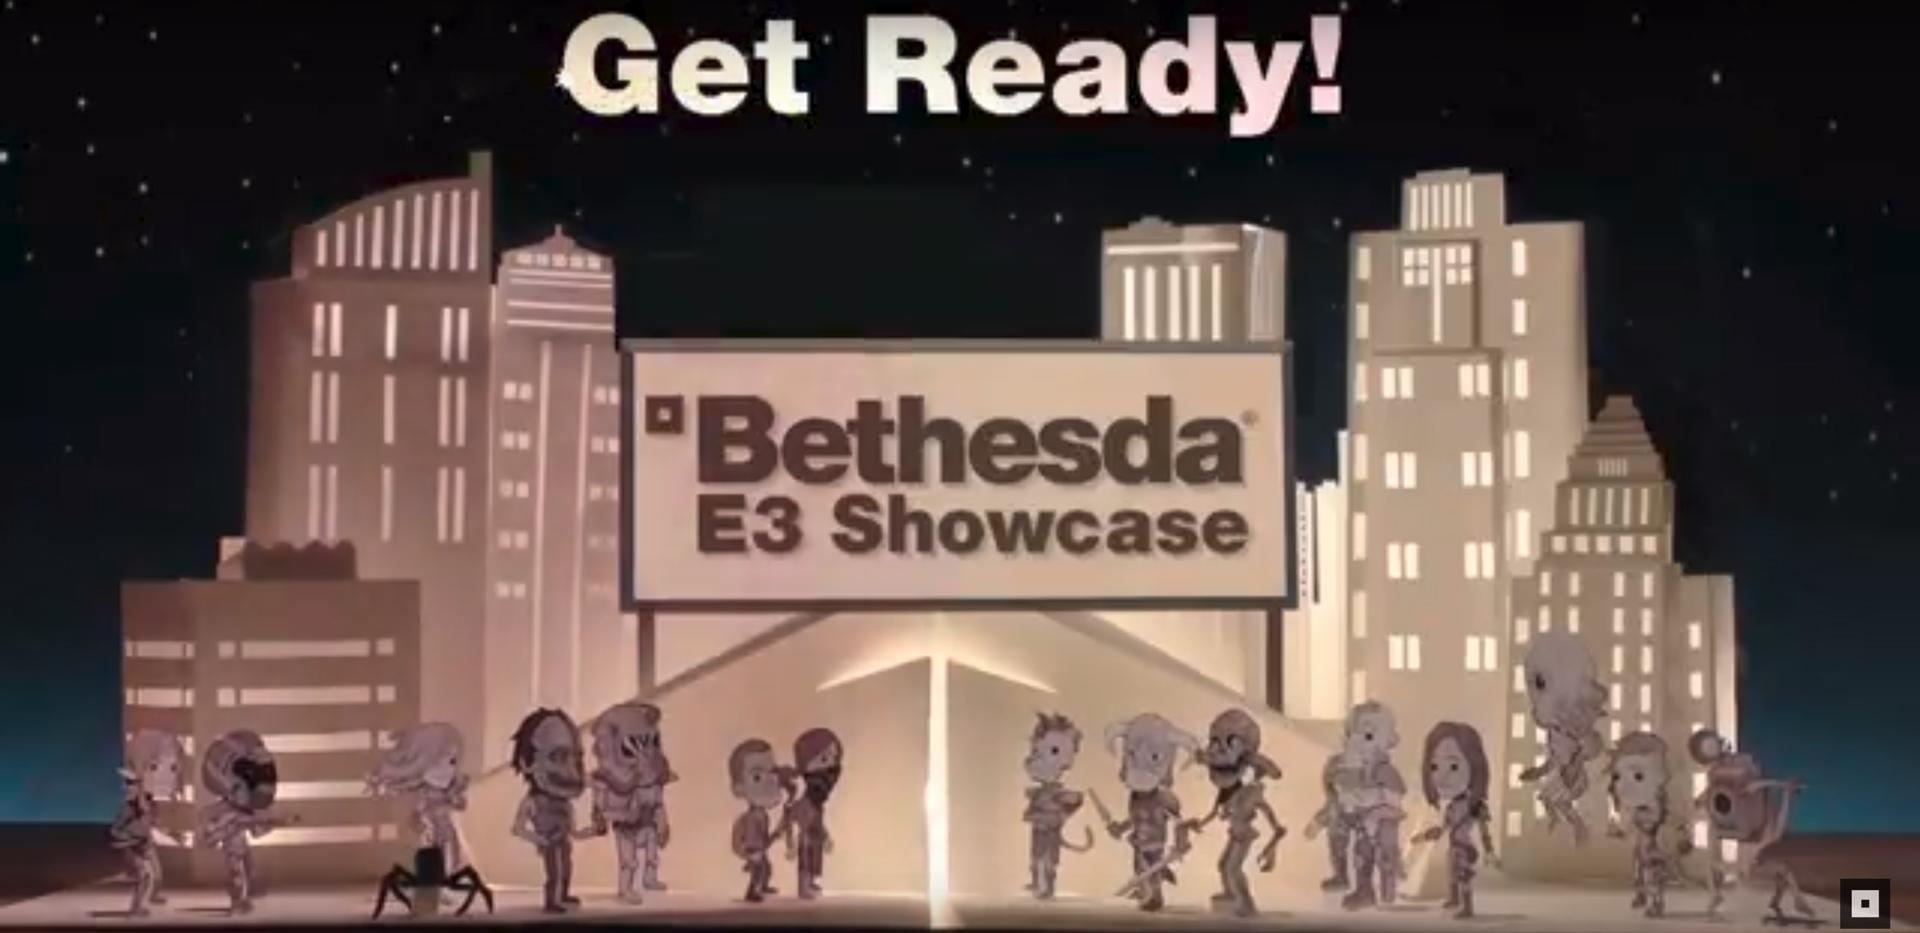 Bethesda Softworks Game Studio, E3 2018 Showcase, Press Conference